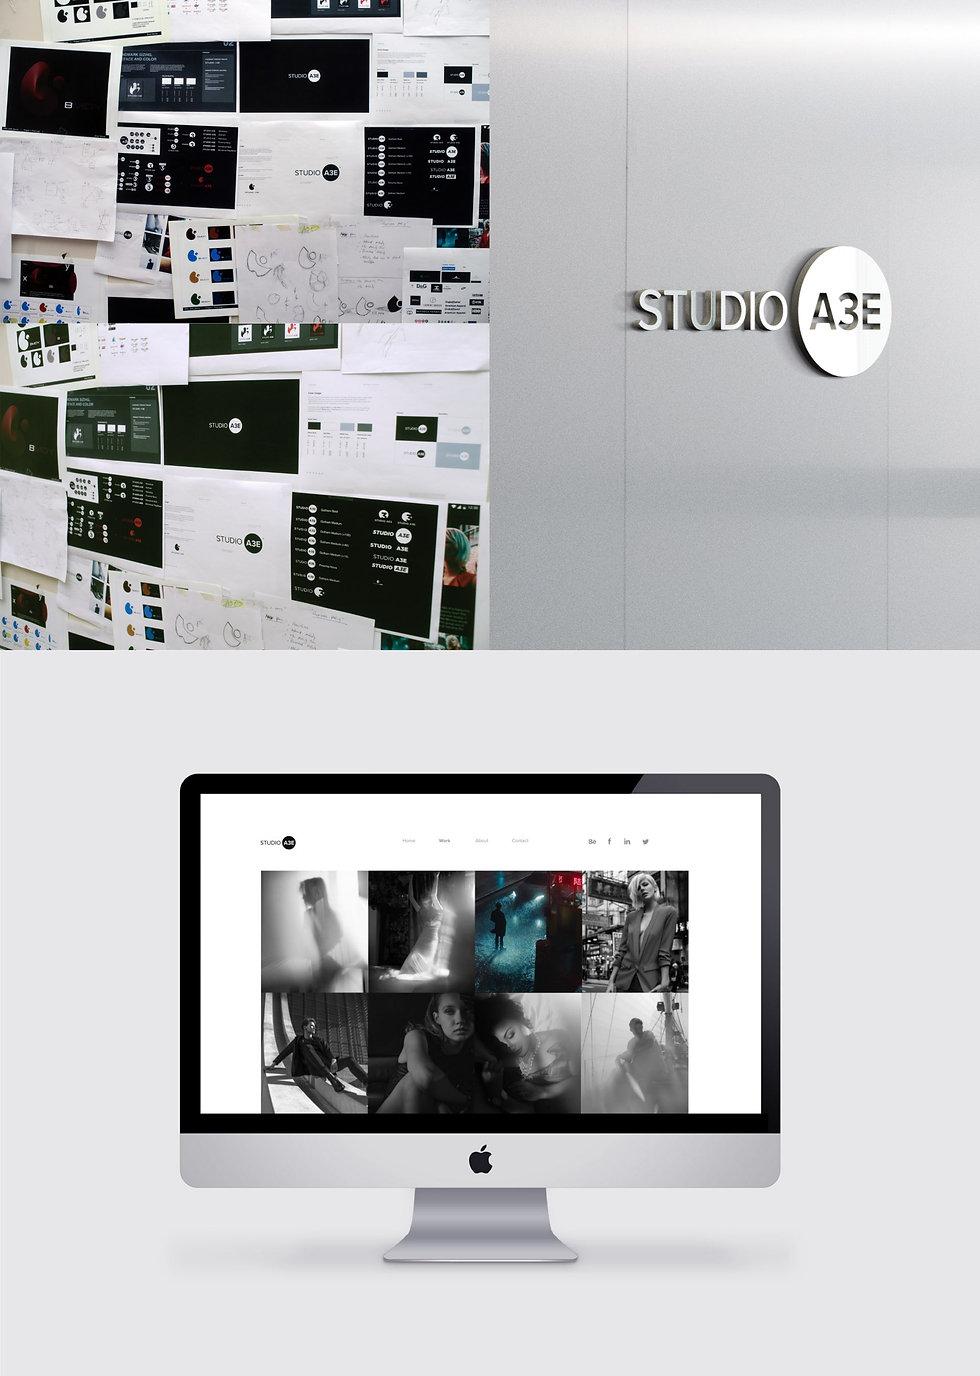 Studio A3E Panel B2.jpg